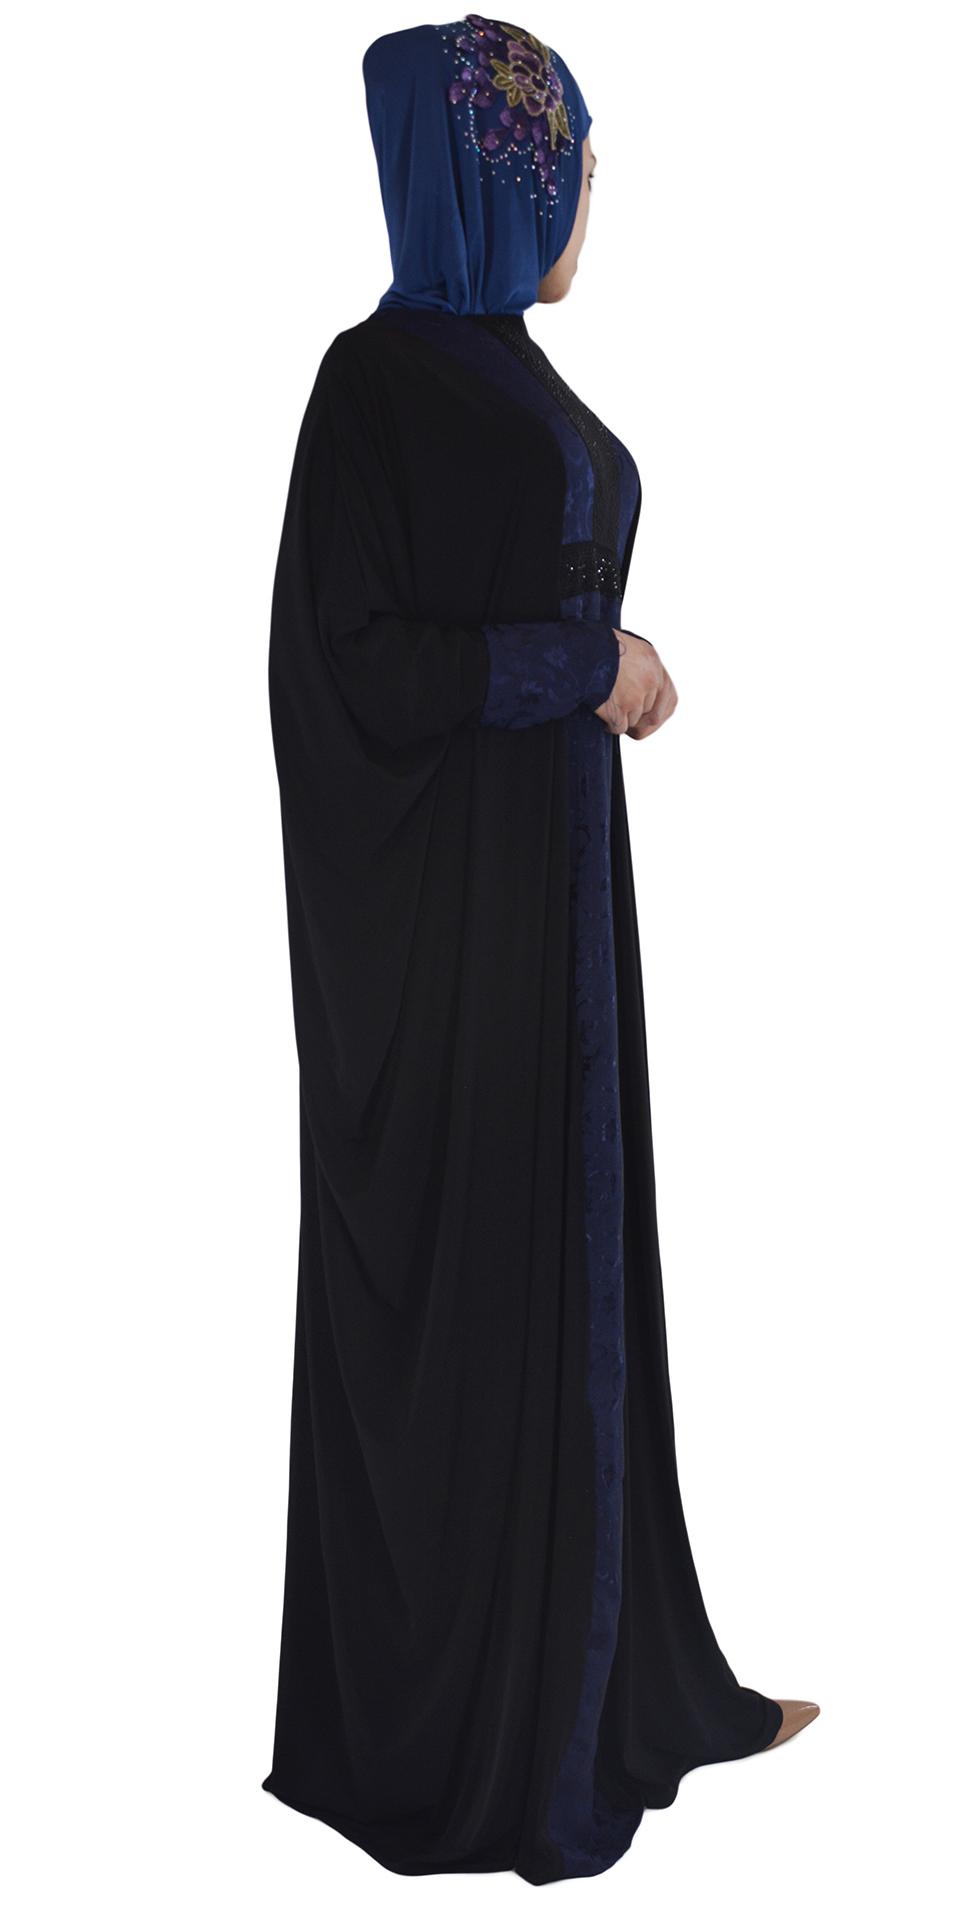 Hania - Black and Navy Abaya Side 3